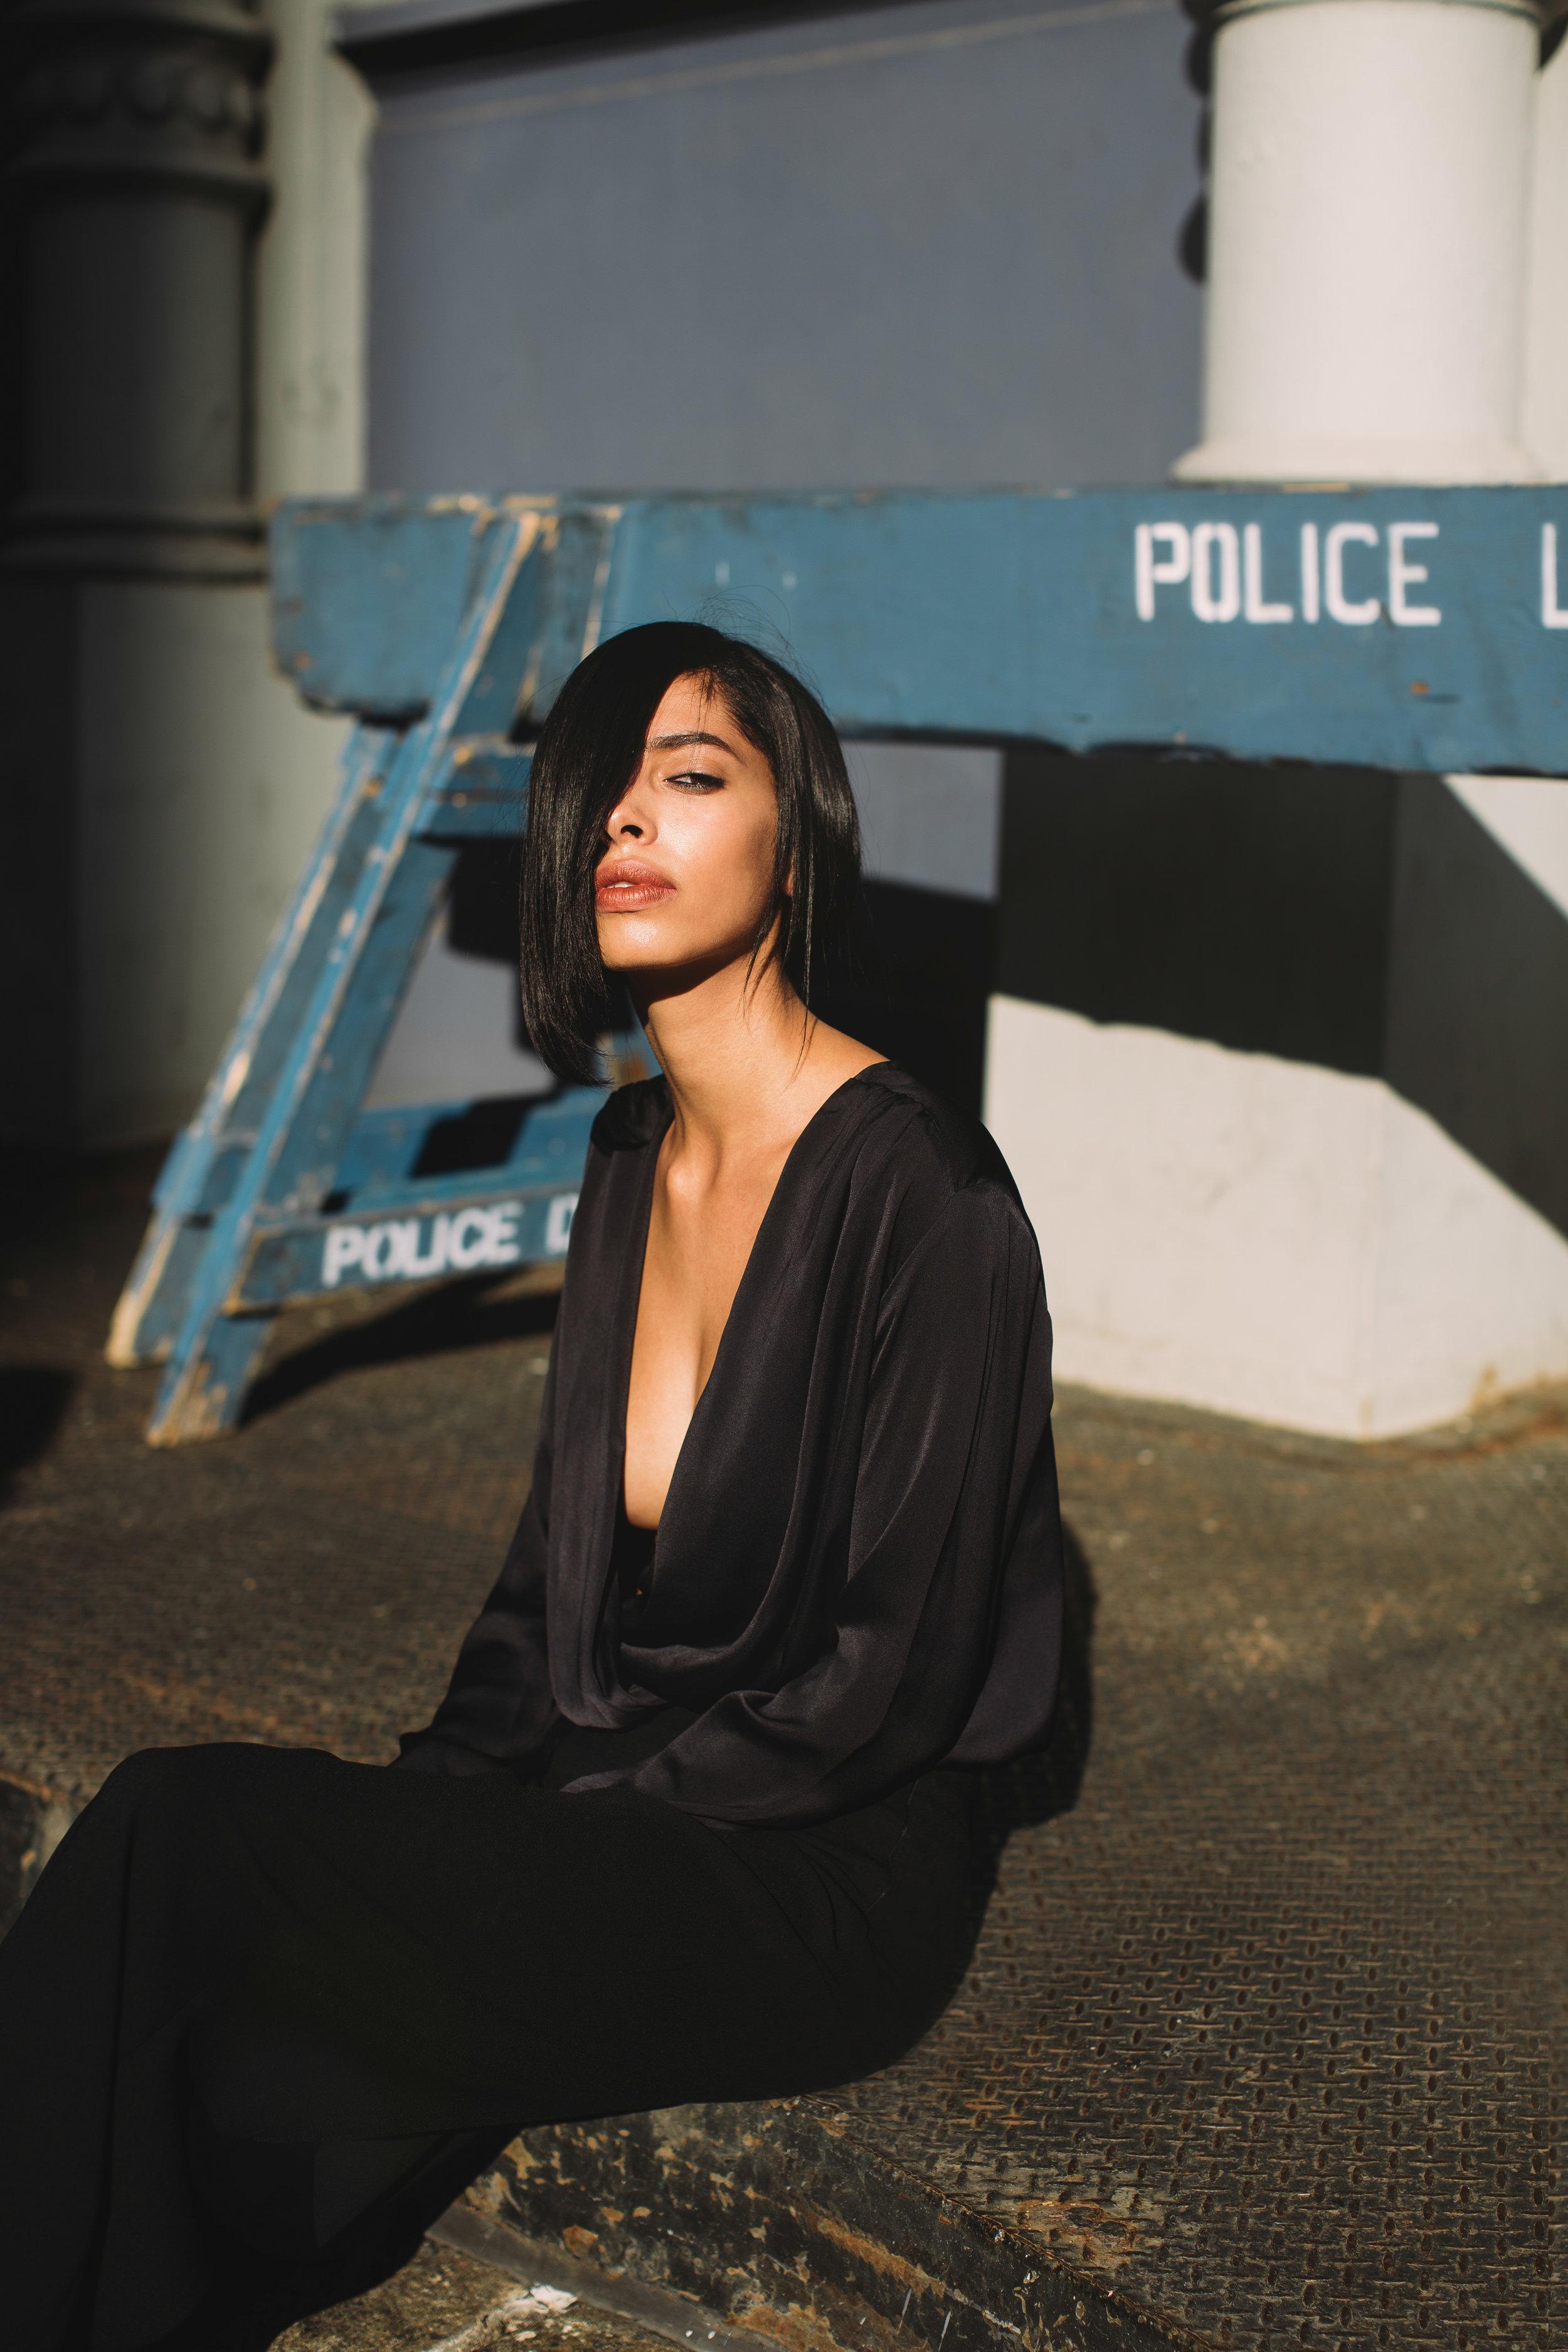 Sydney_KP_KAUR (2 of 18).JPG